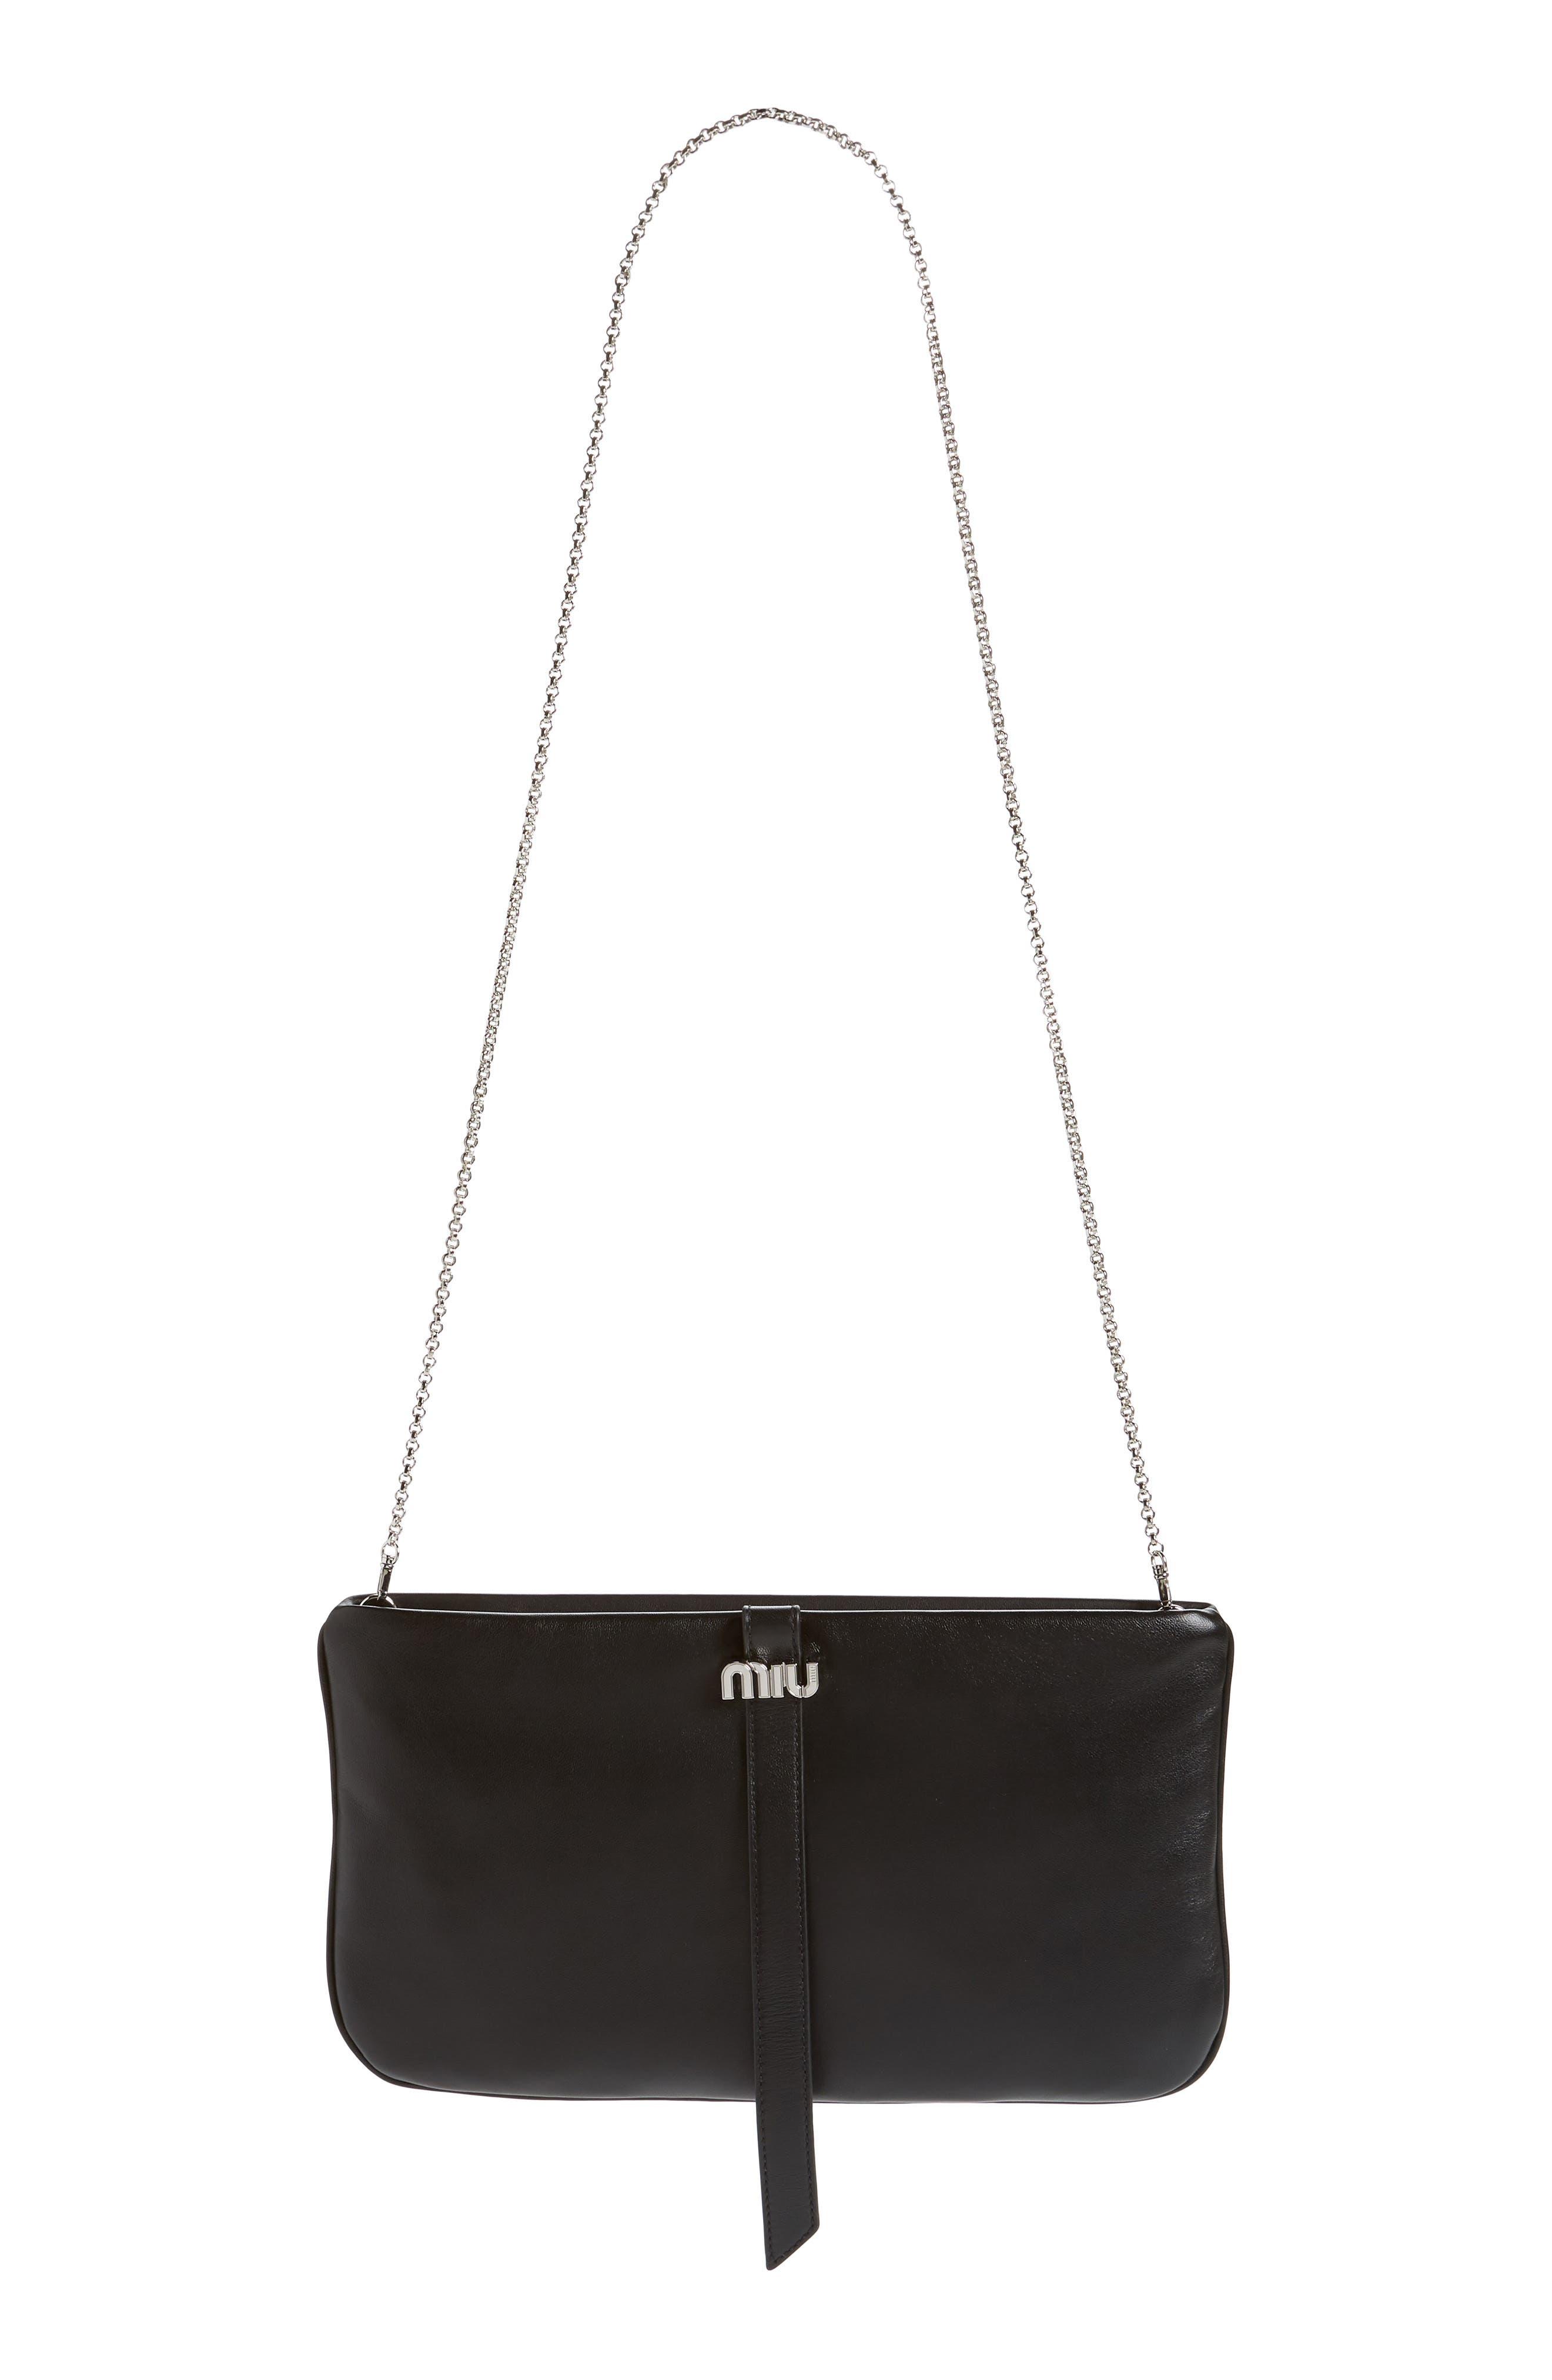 MIU MIU, Lambskin Leather Clutch on a Chain, Main thumbnail 1, color, NERO